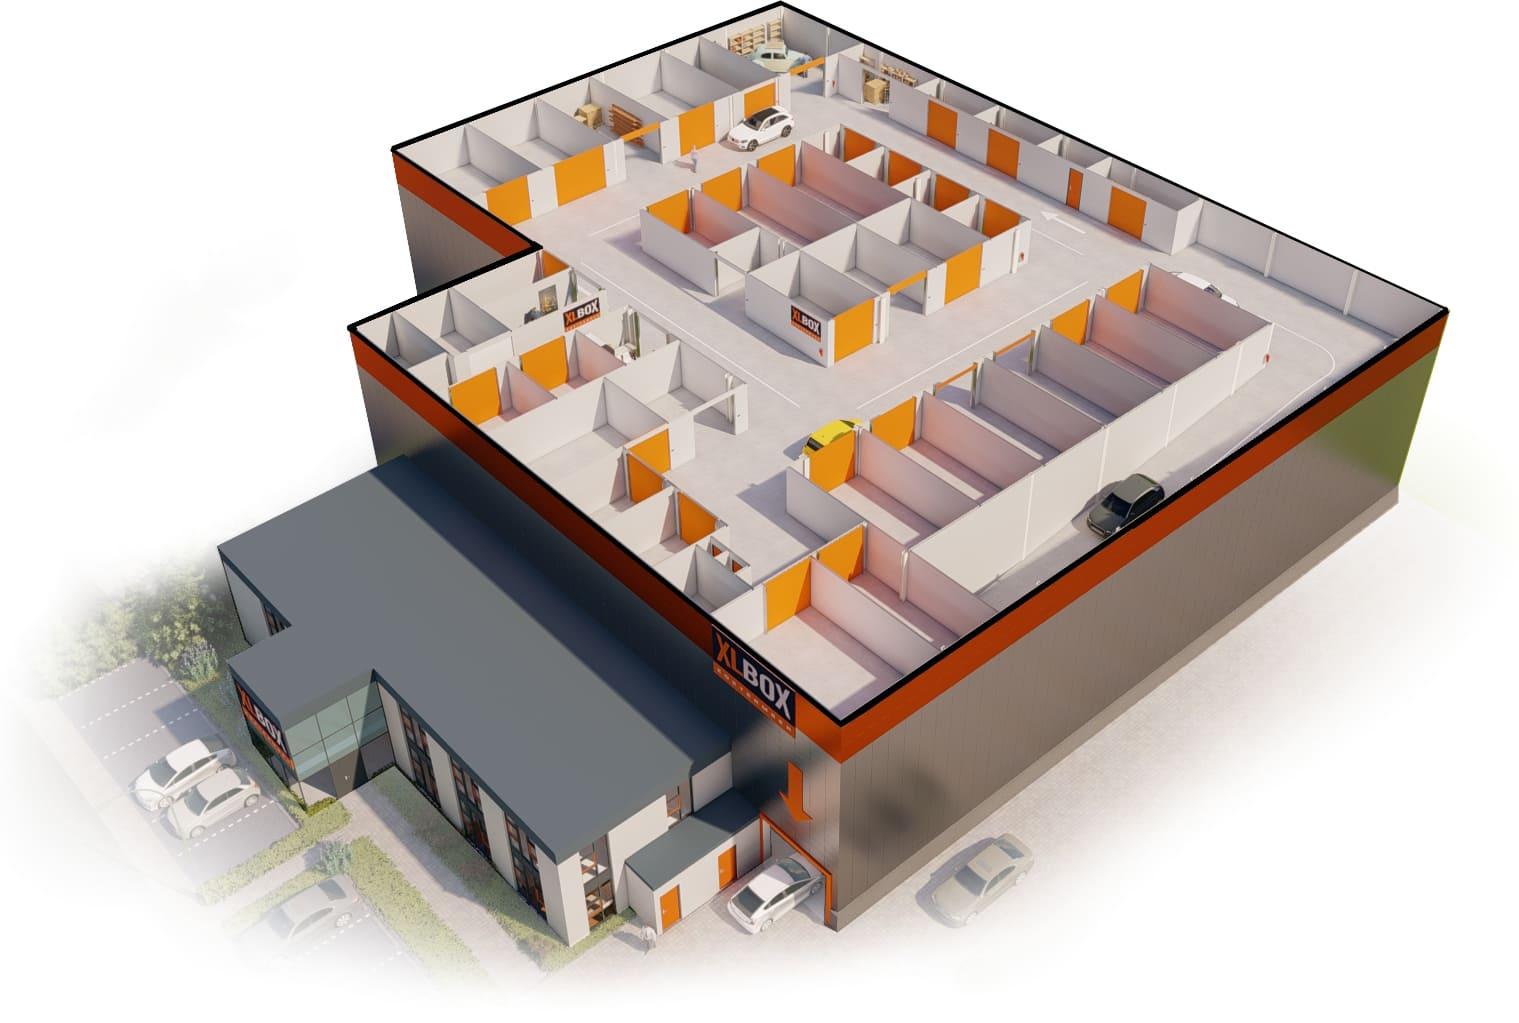 XLBox concept